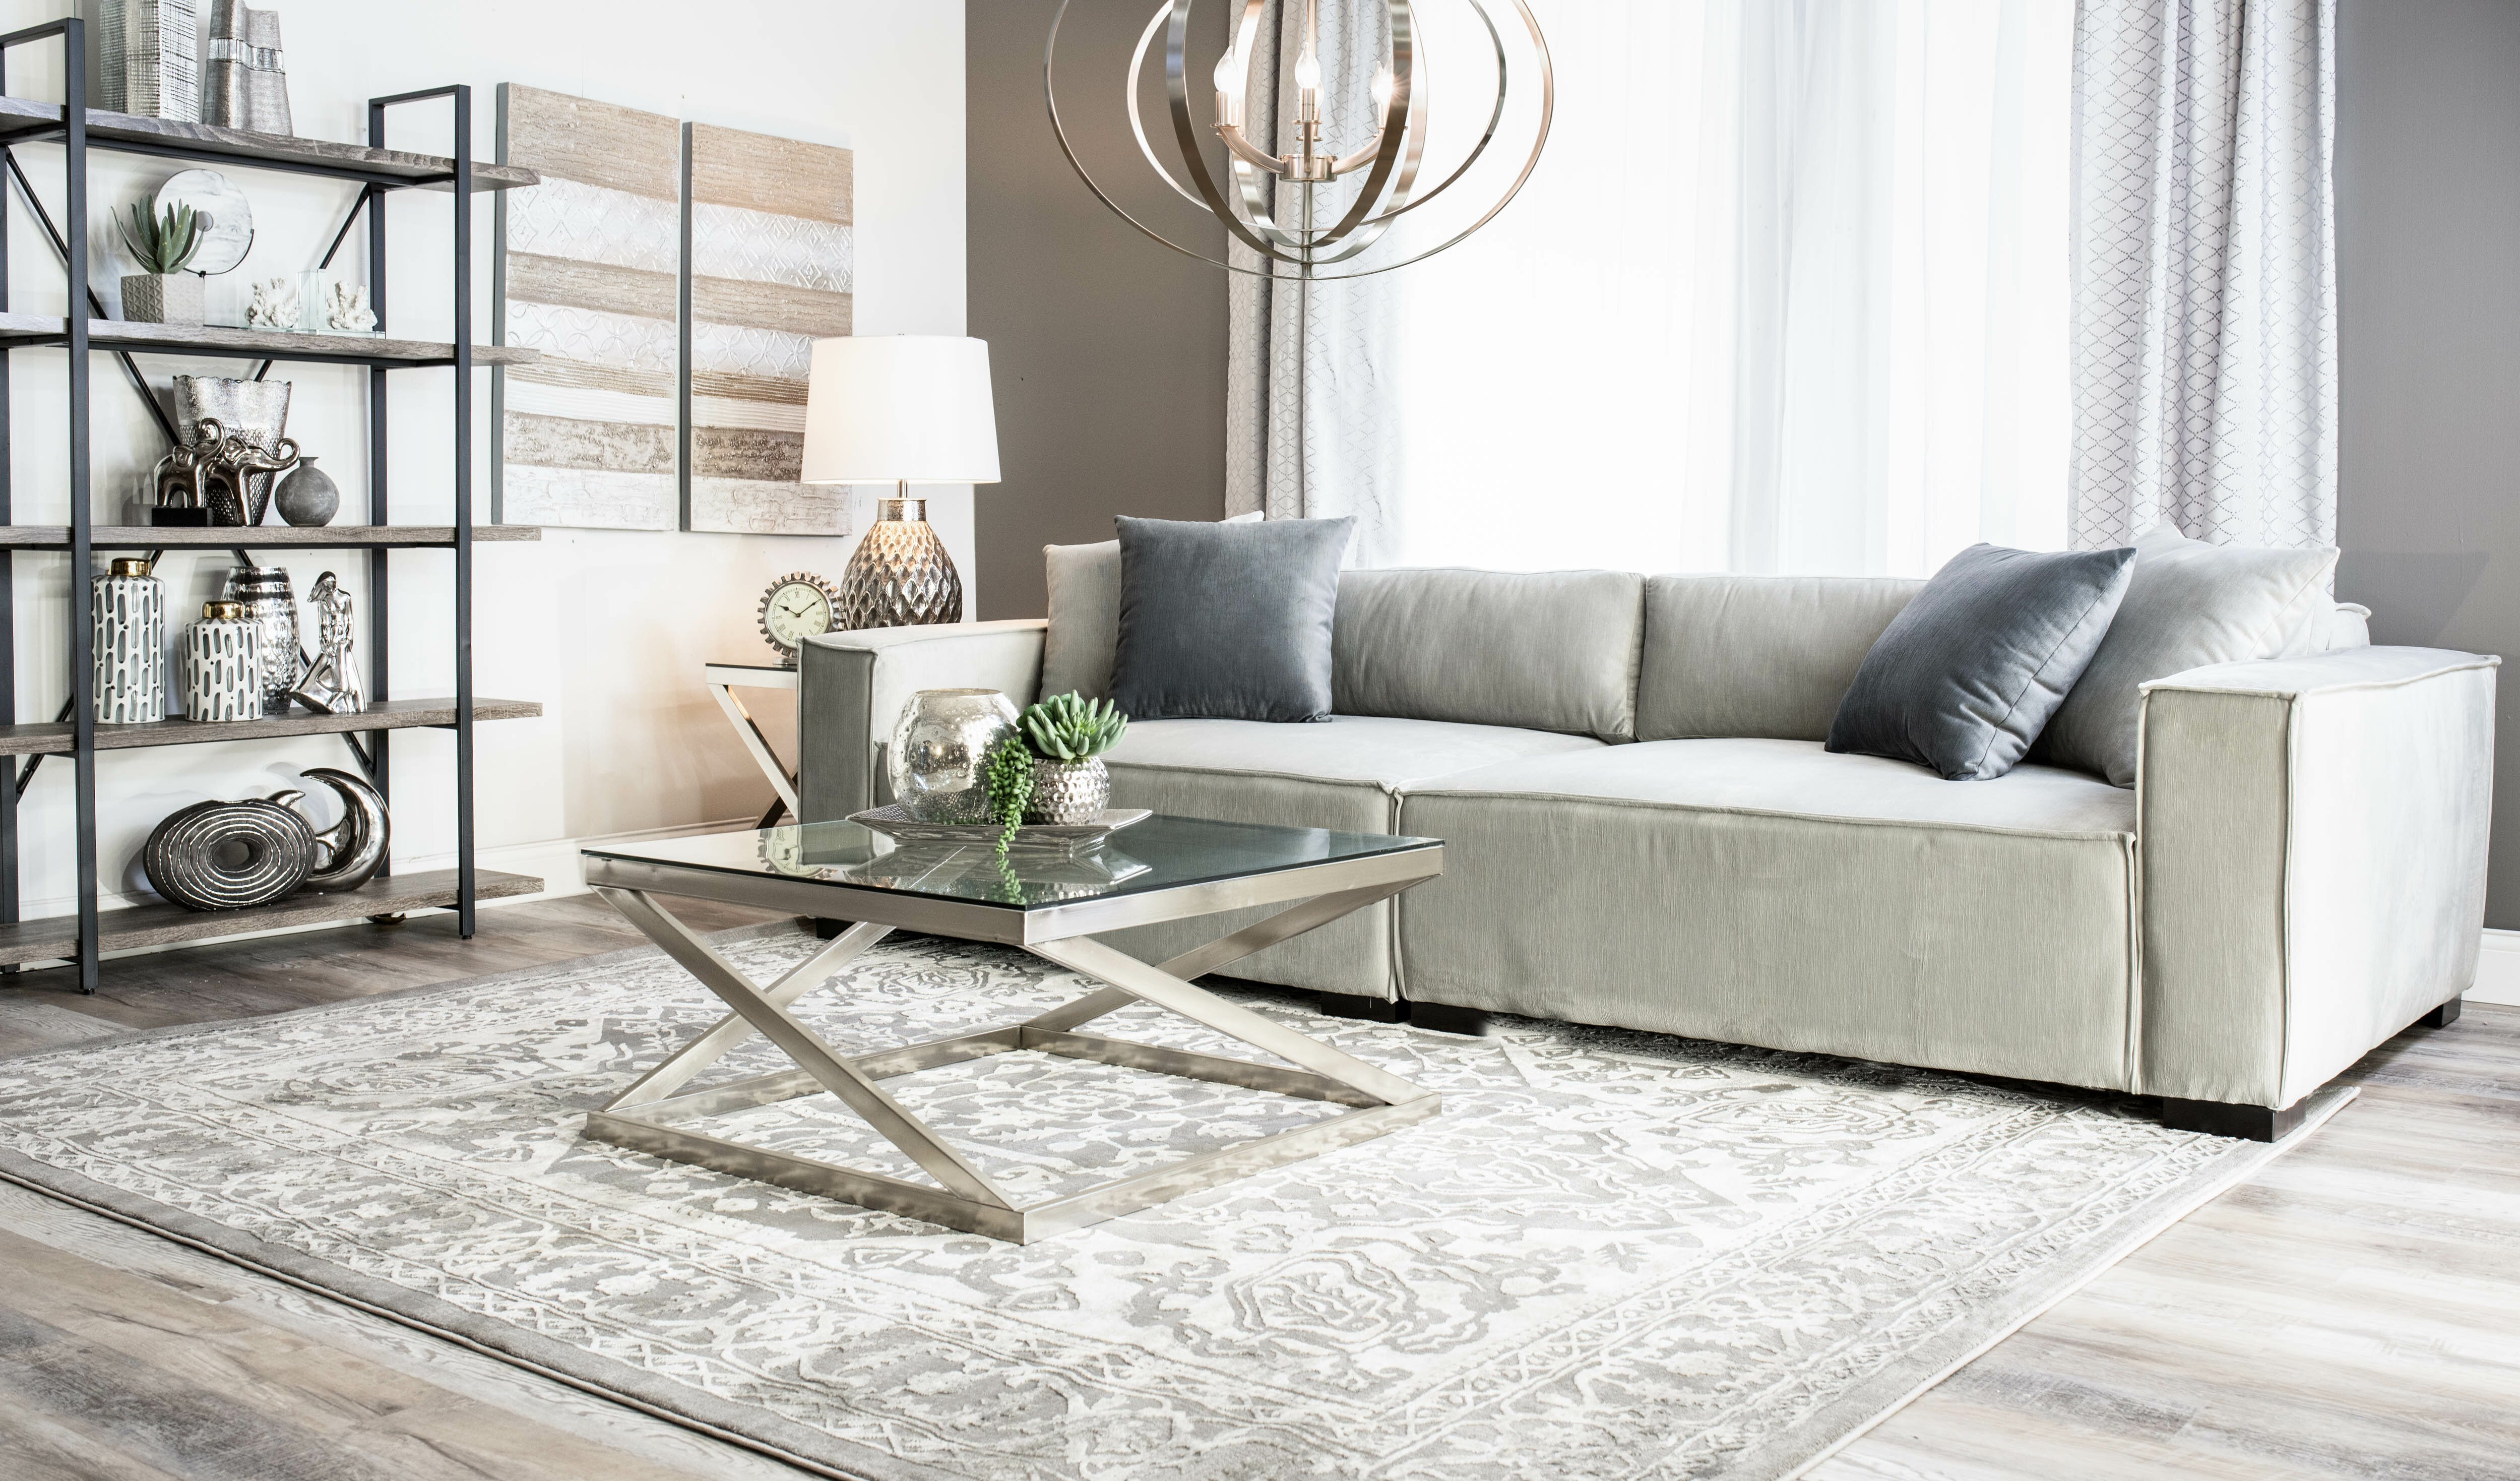 Astonishing Maxwell Symmetrical Modular Sectional Dailytribune Chair Design For Home Dailytribuneorg